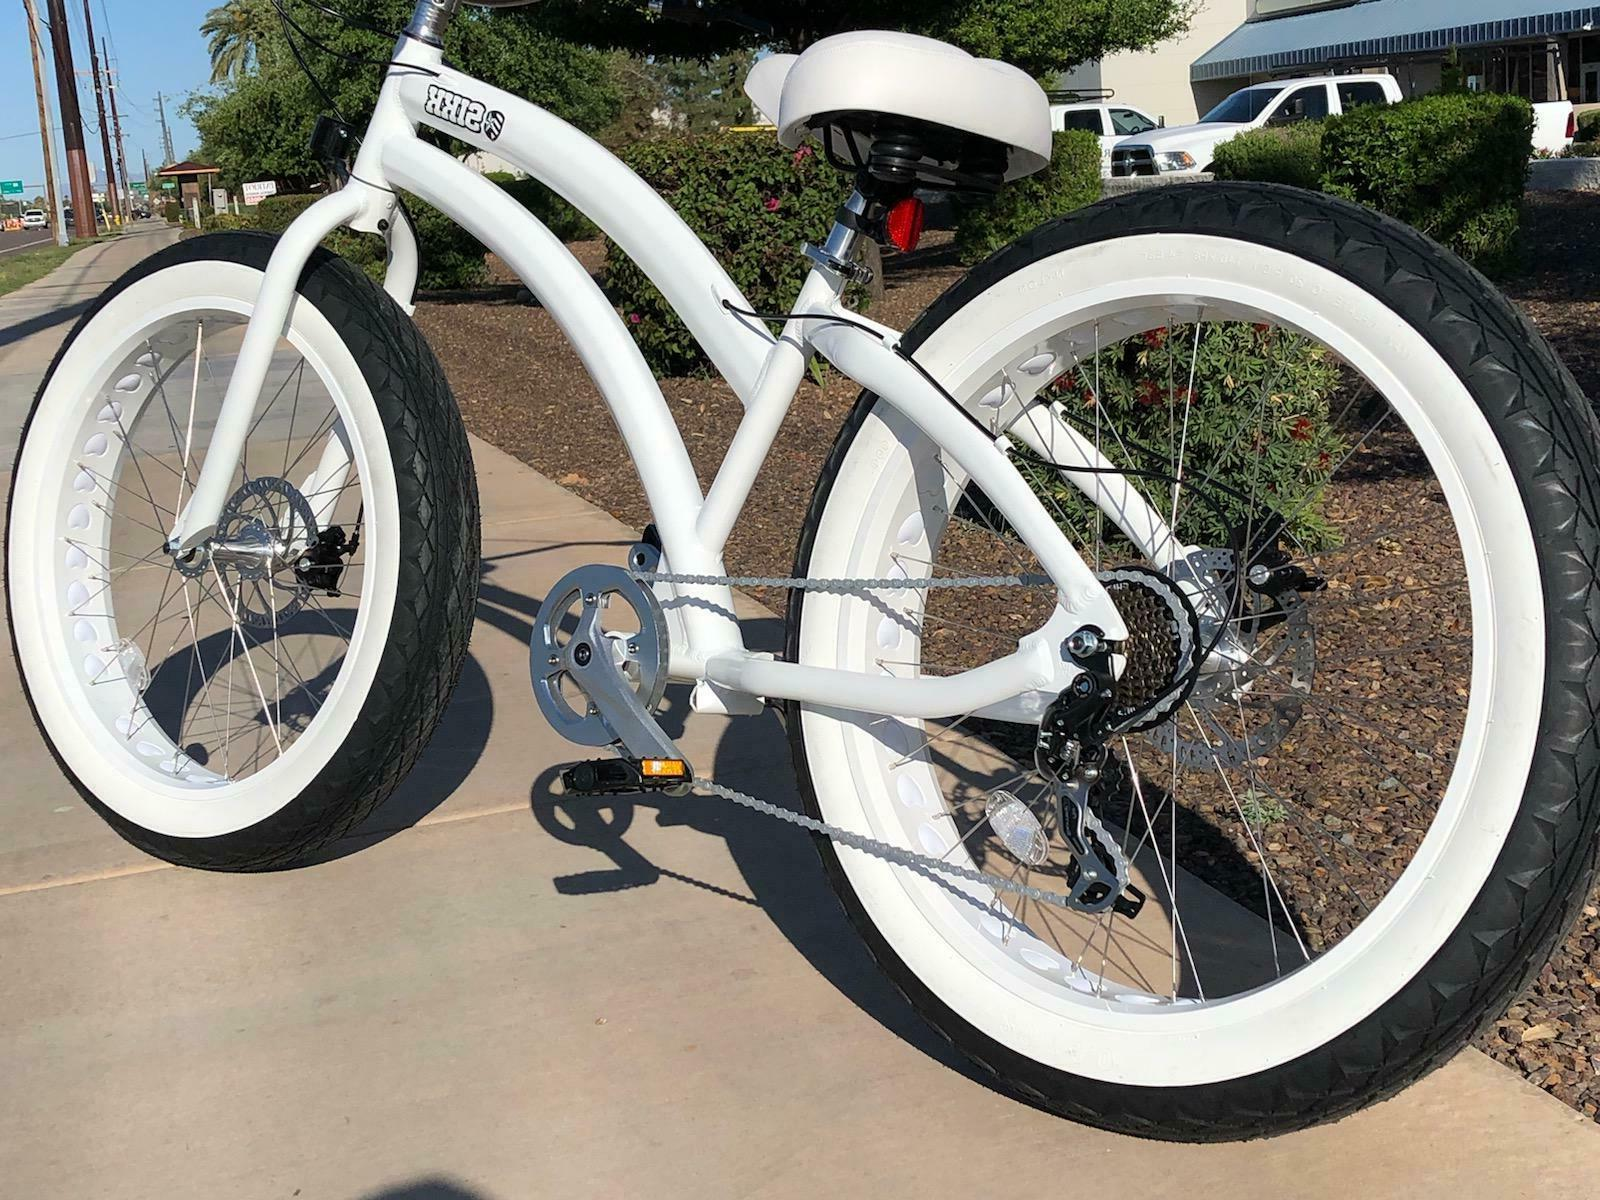 Custom Beach Comfortable Bicycle